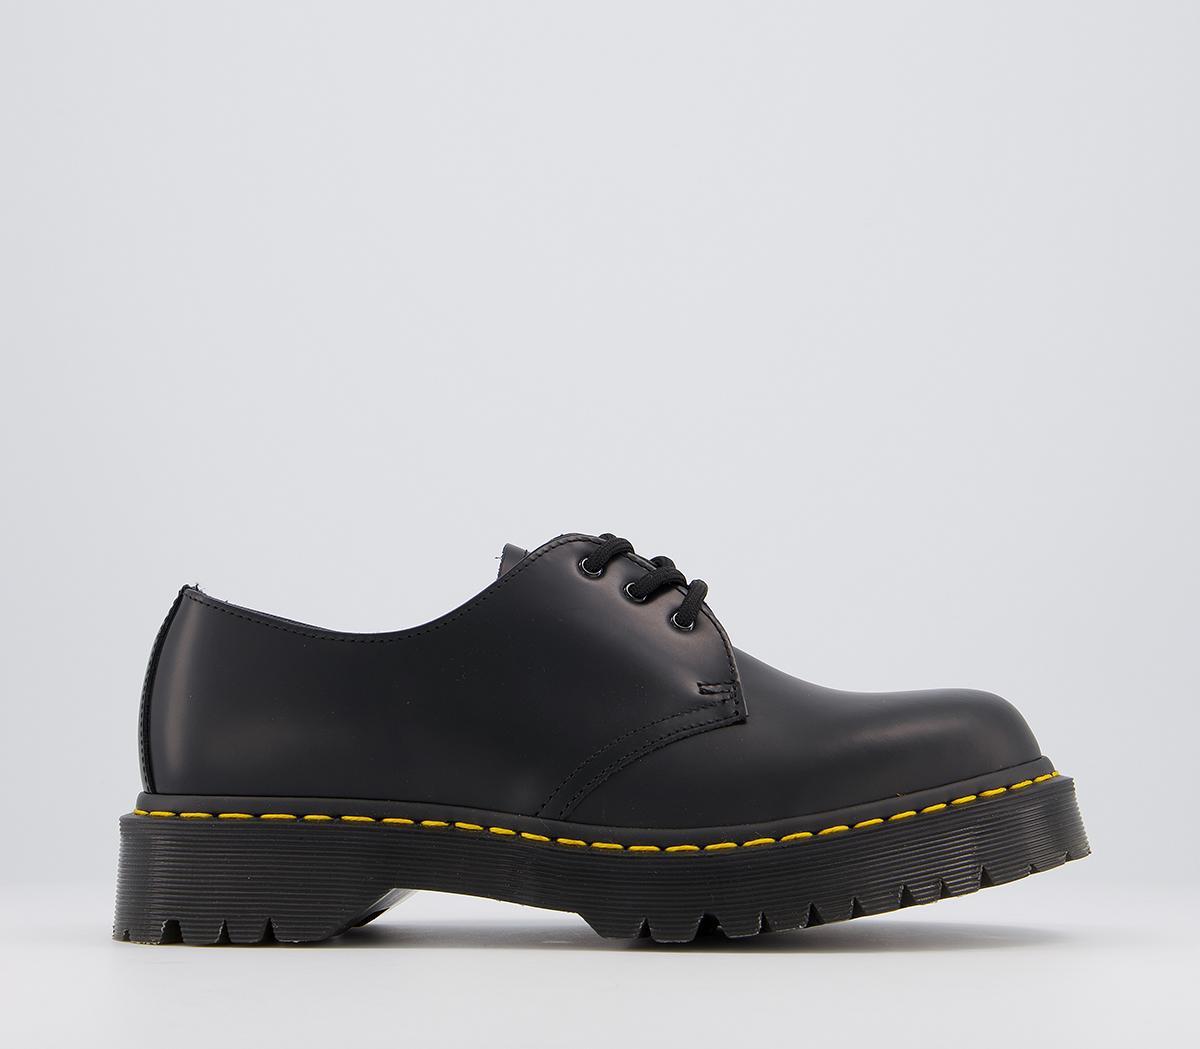 1461 Bex Shoes